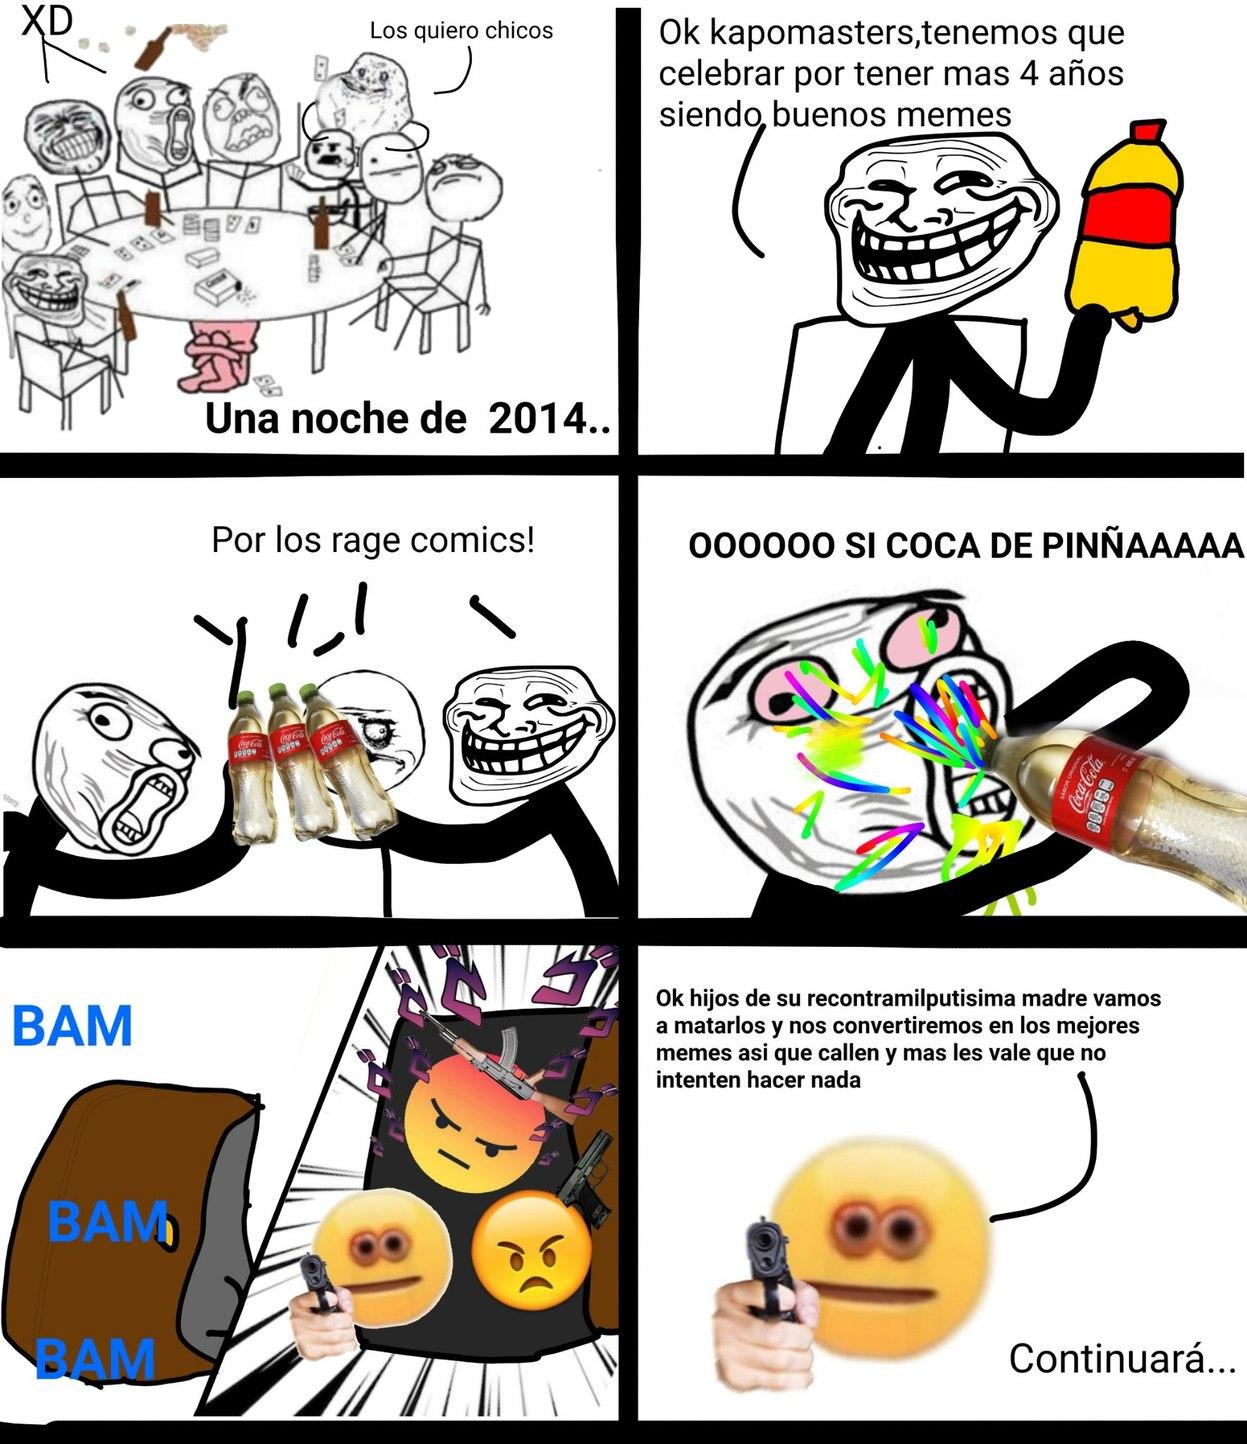 Emojis vs rage comics;la batalla capitulo 1 - meme